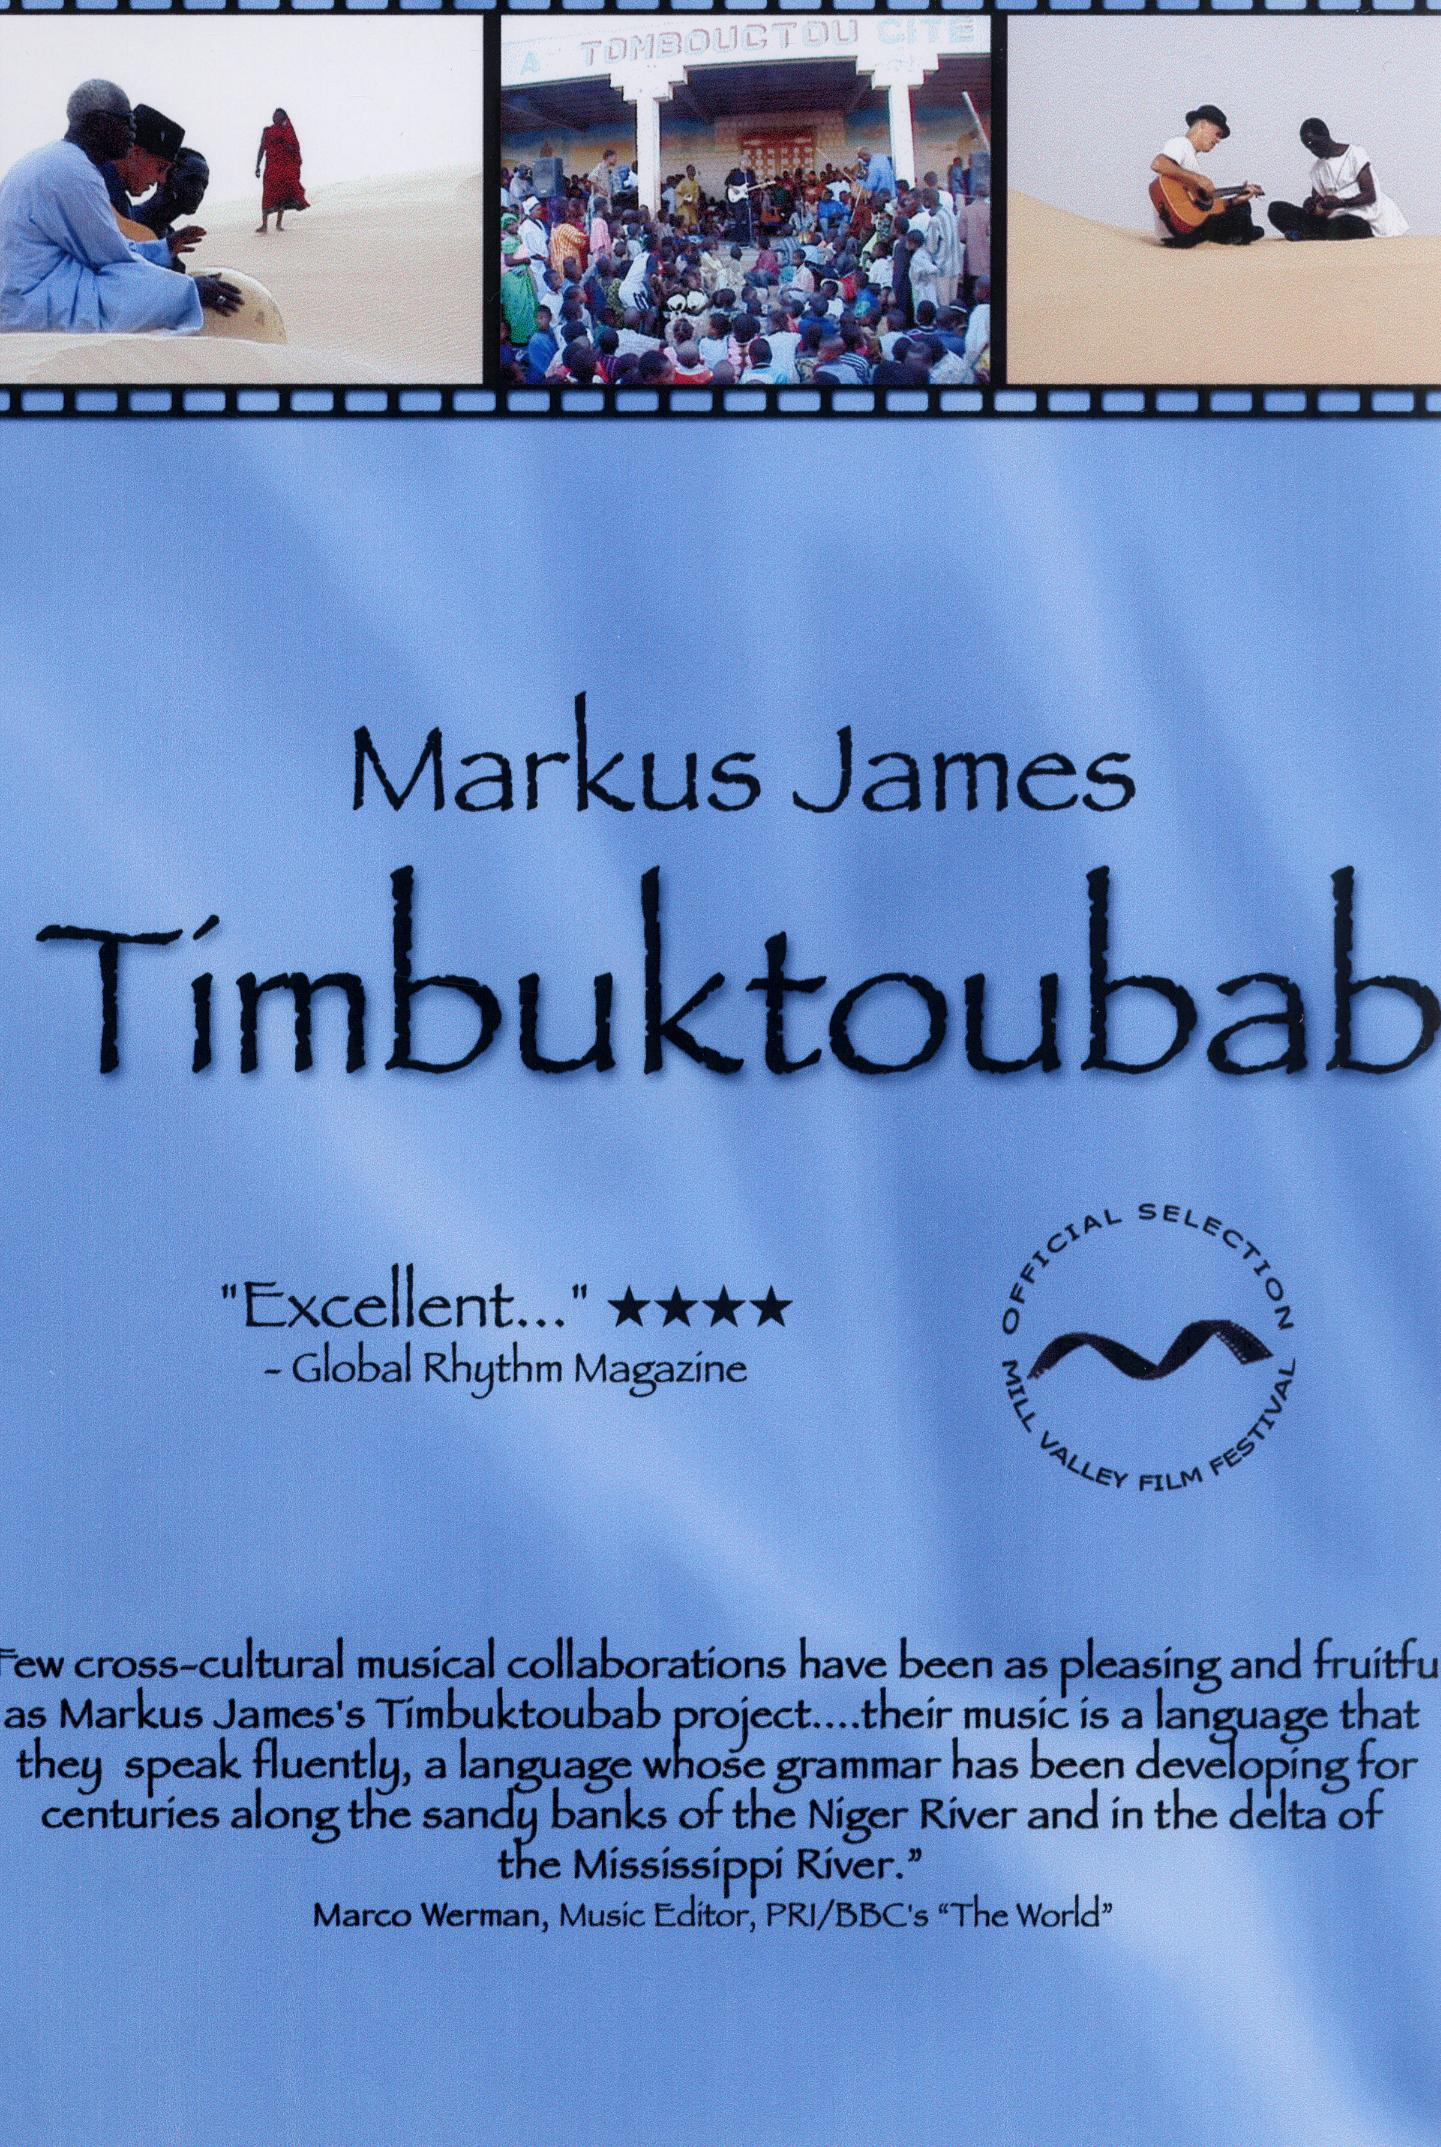 Markus James: Timbuktoubab